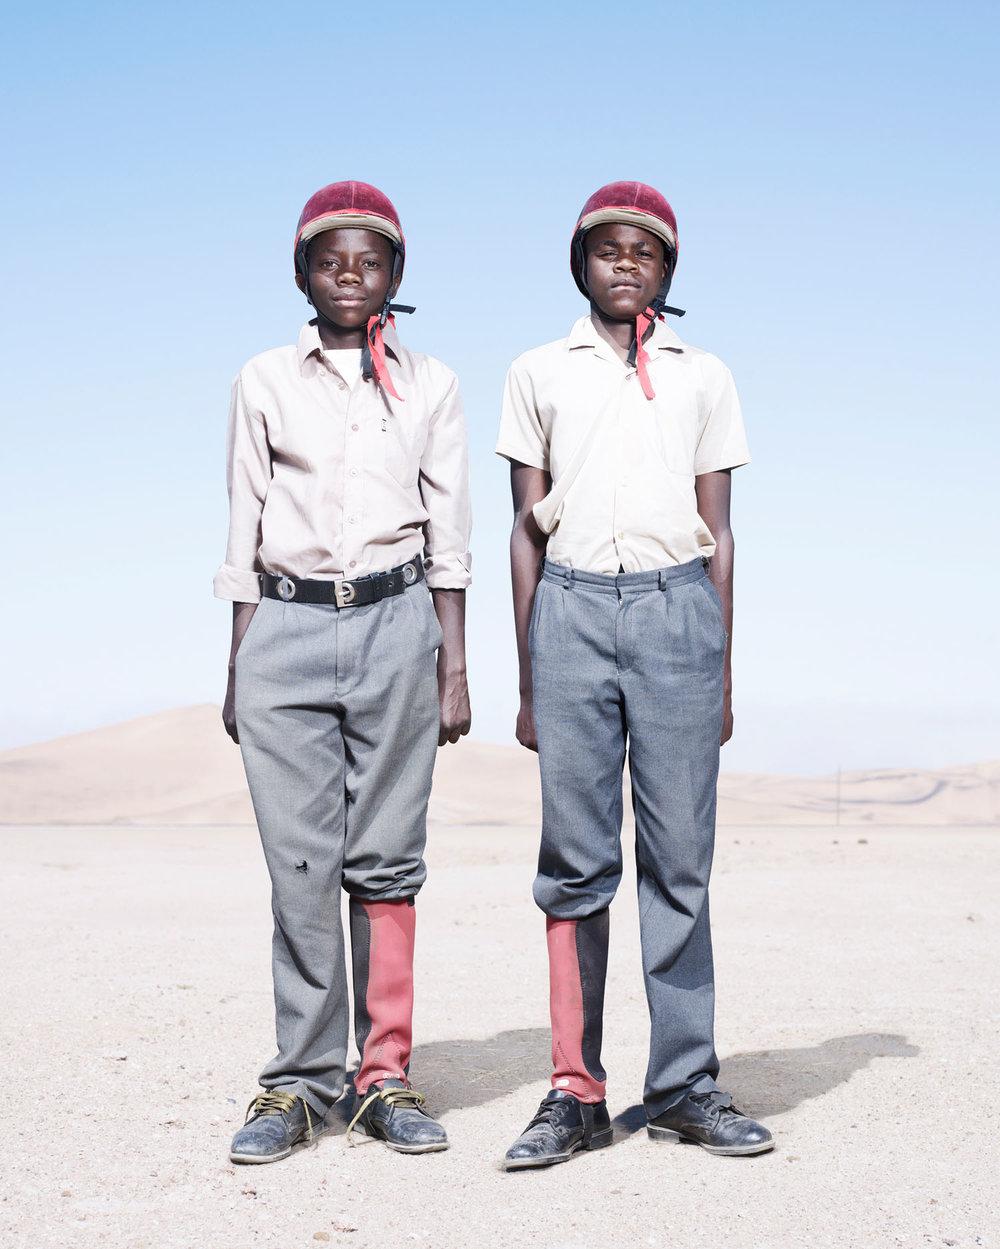 Herero Cavalry Cadets (2012)